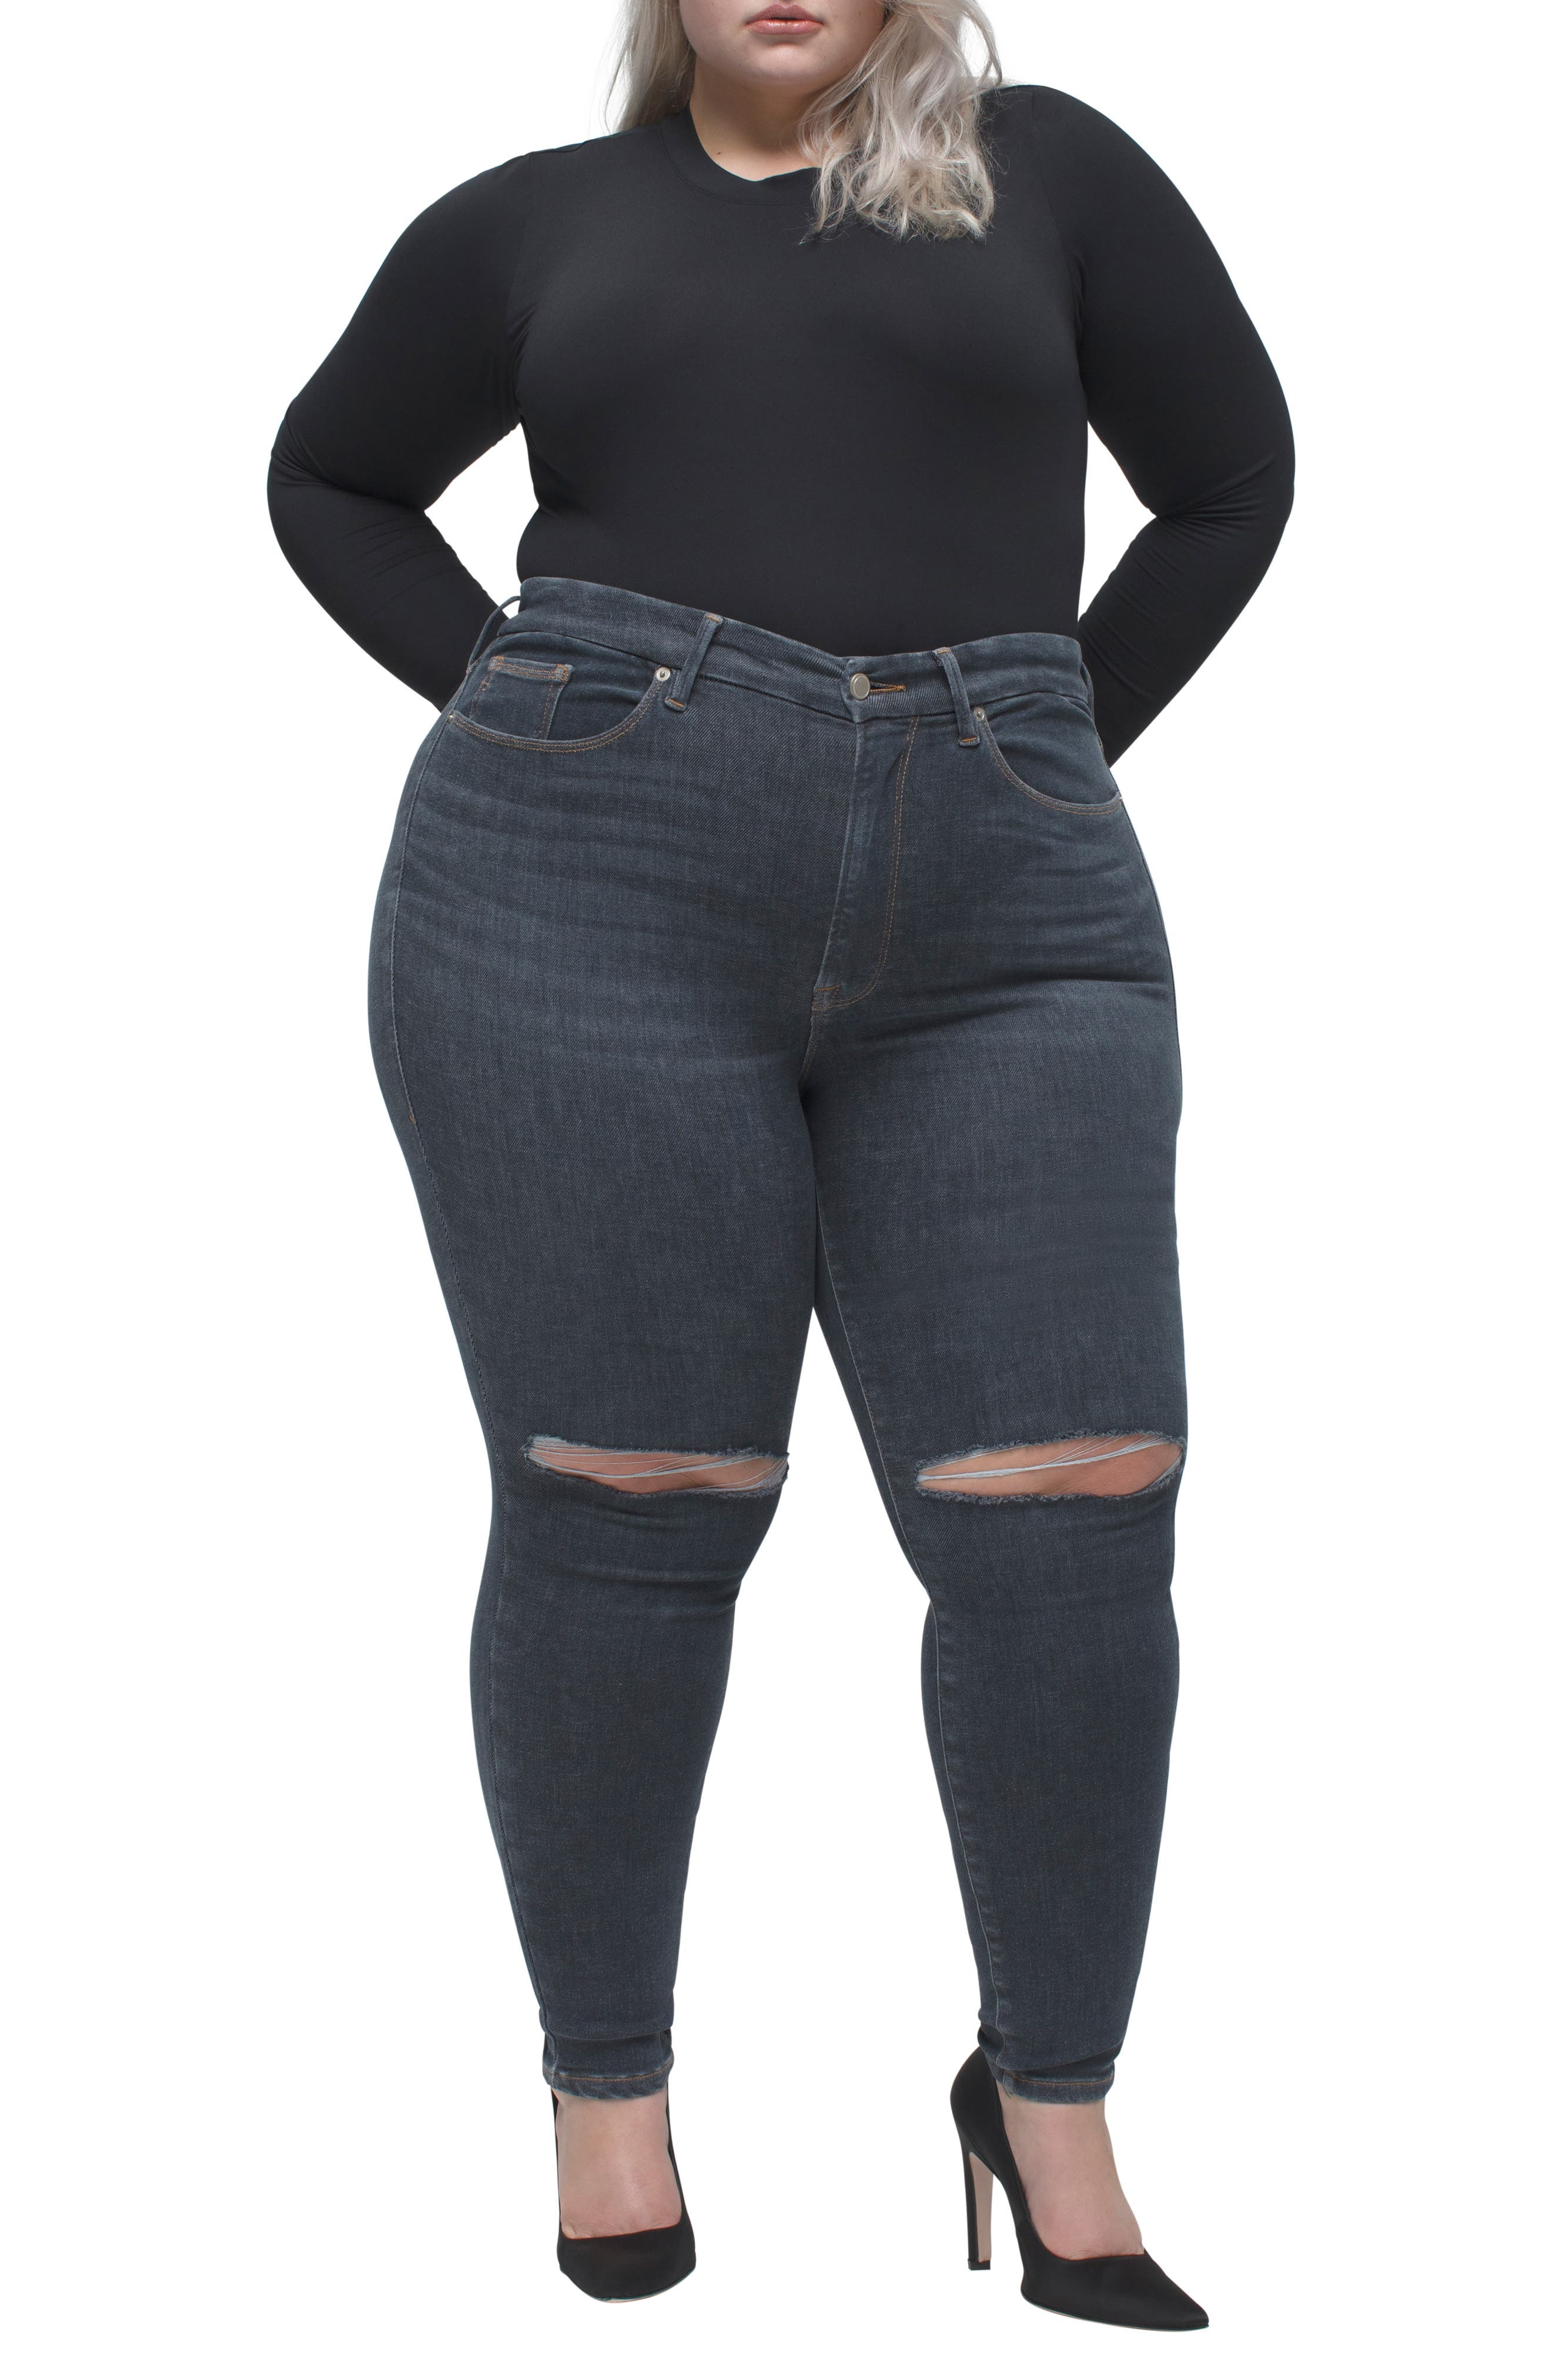 Women's Good American Always Fits Skinny Jeans